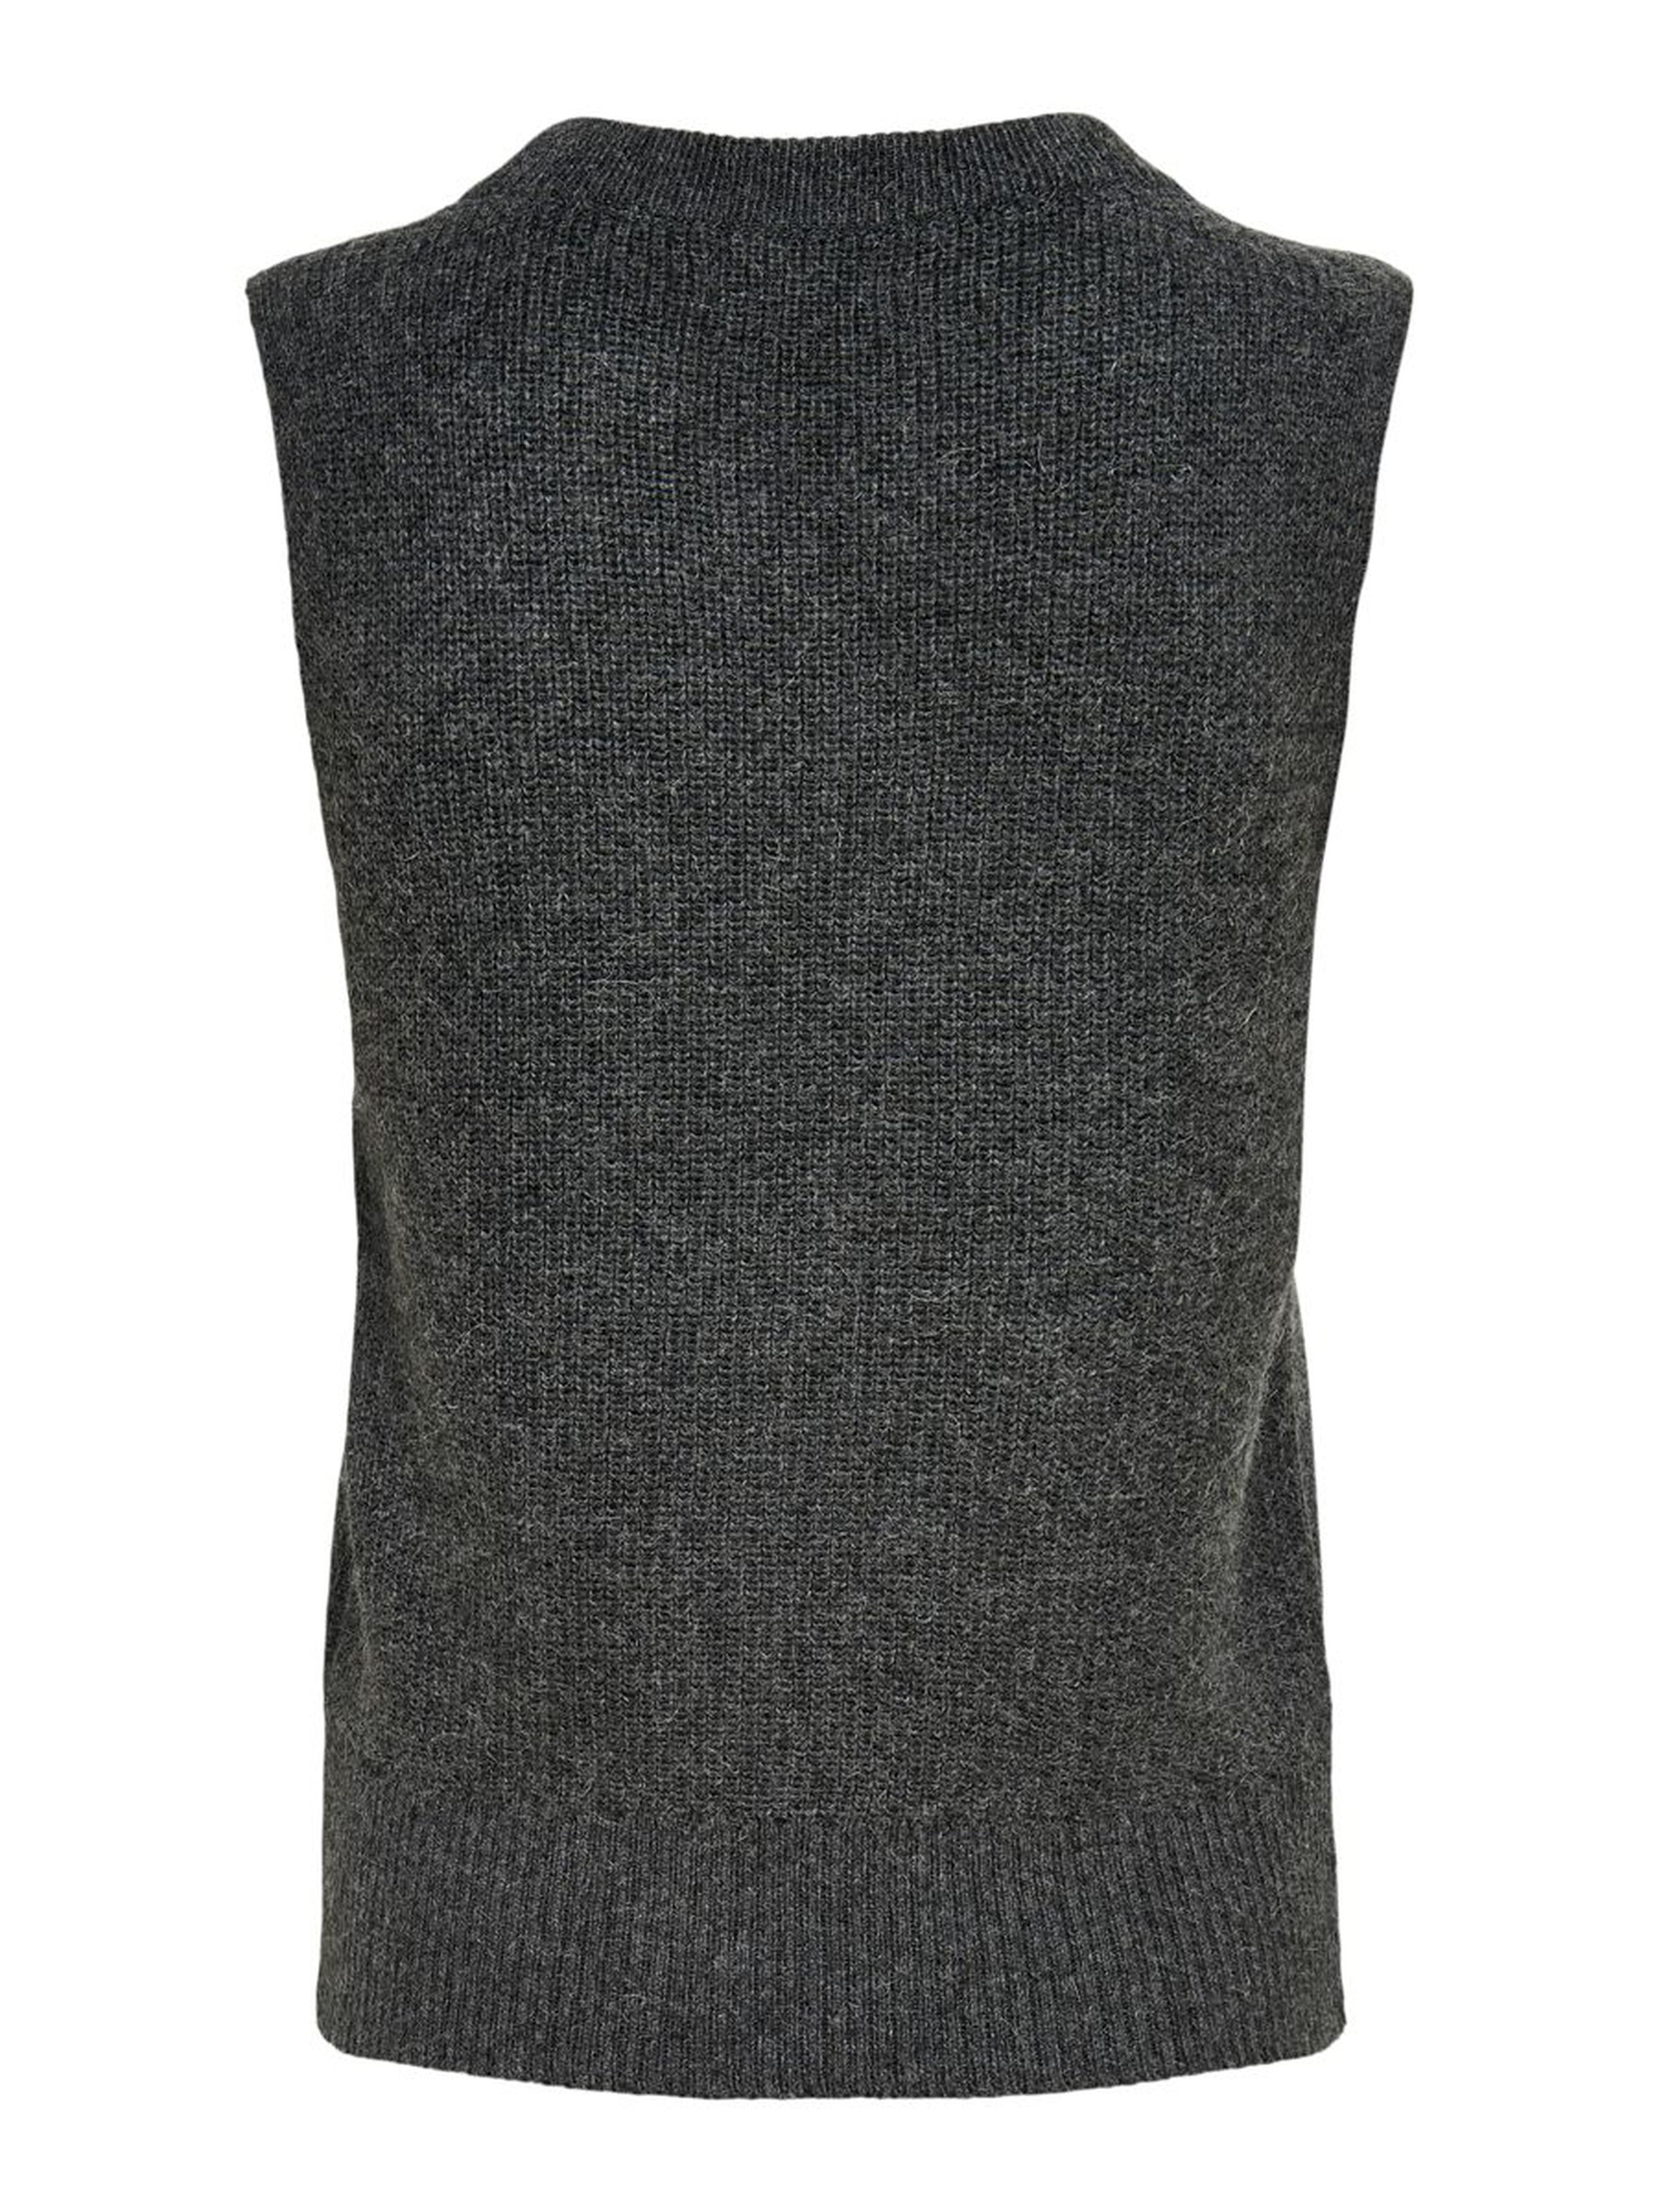 Only Paris strik vest, dark grey melange, small